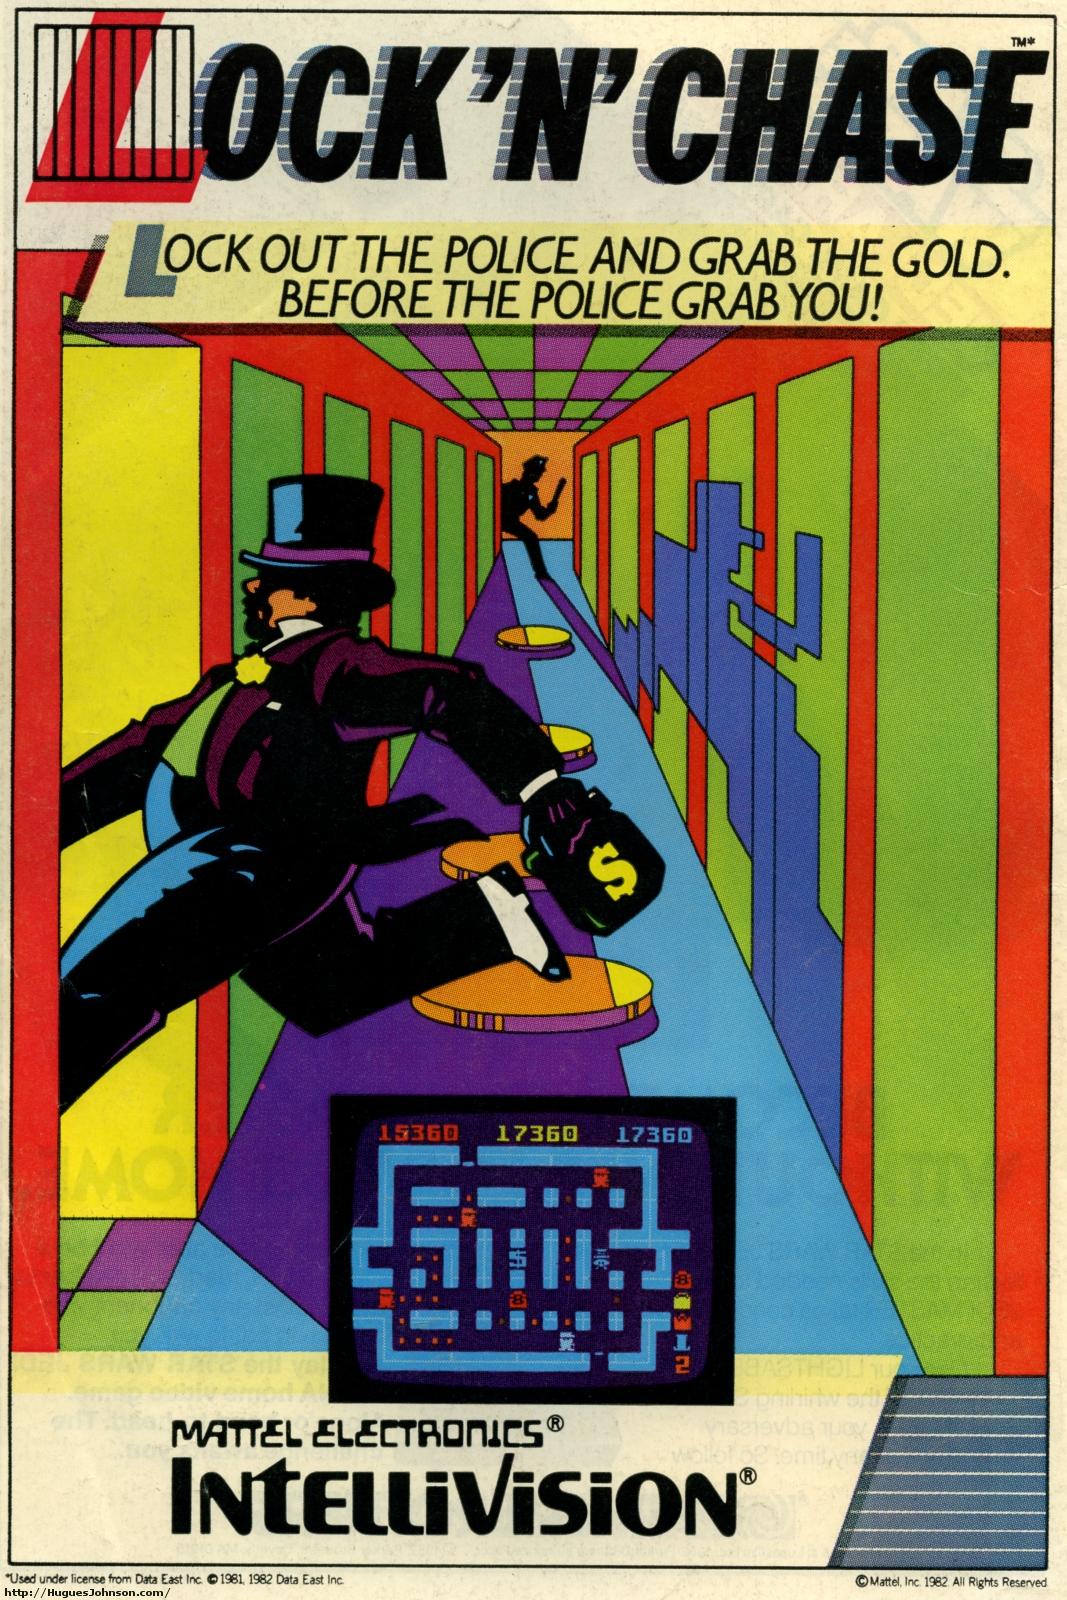 Huguesjohnson Com Atari And Intellivision Ads